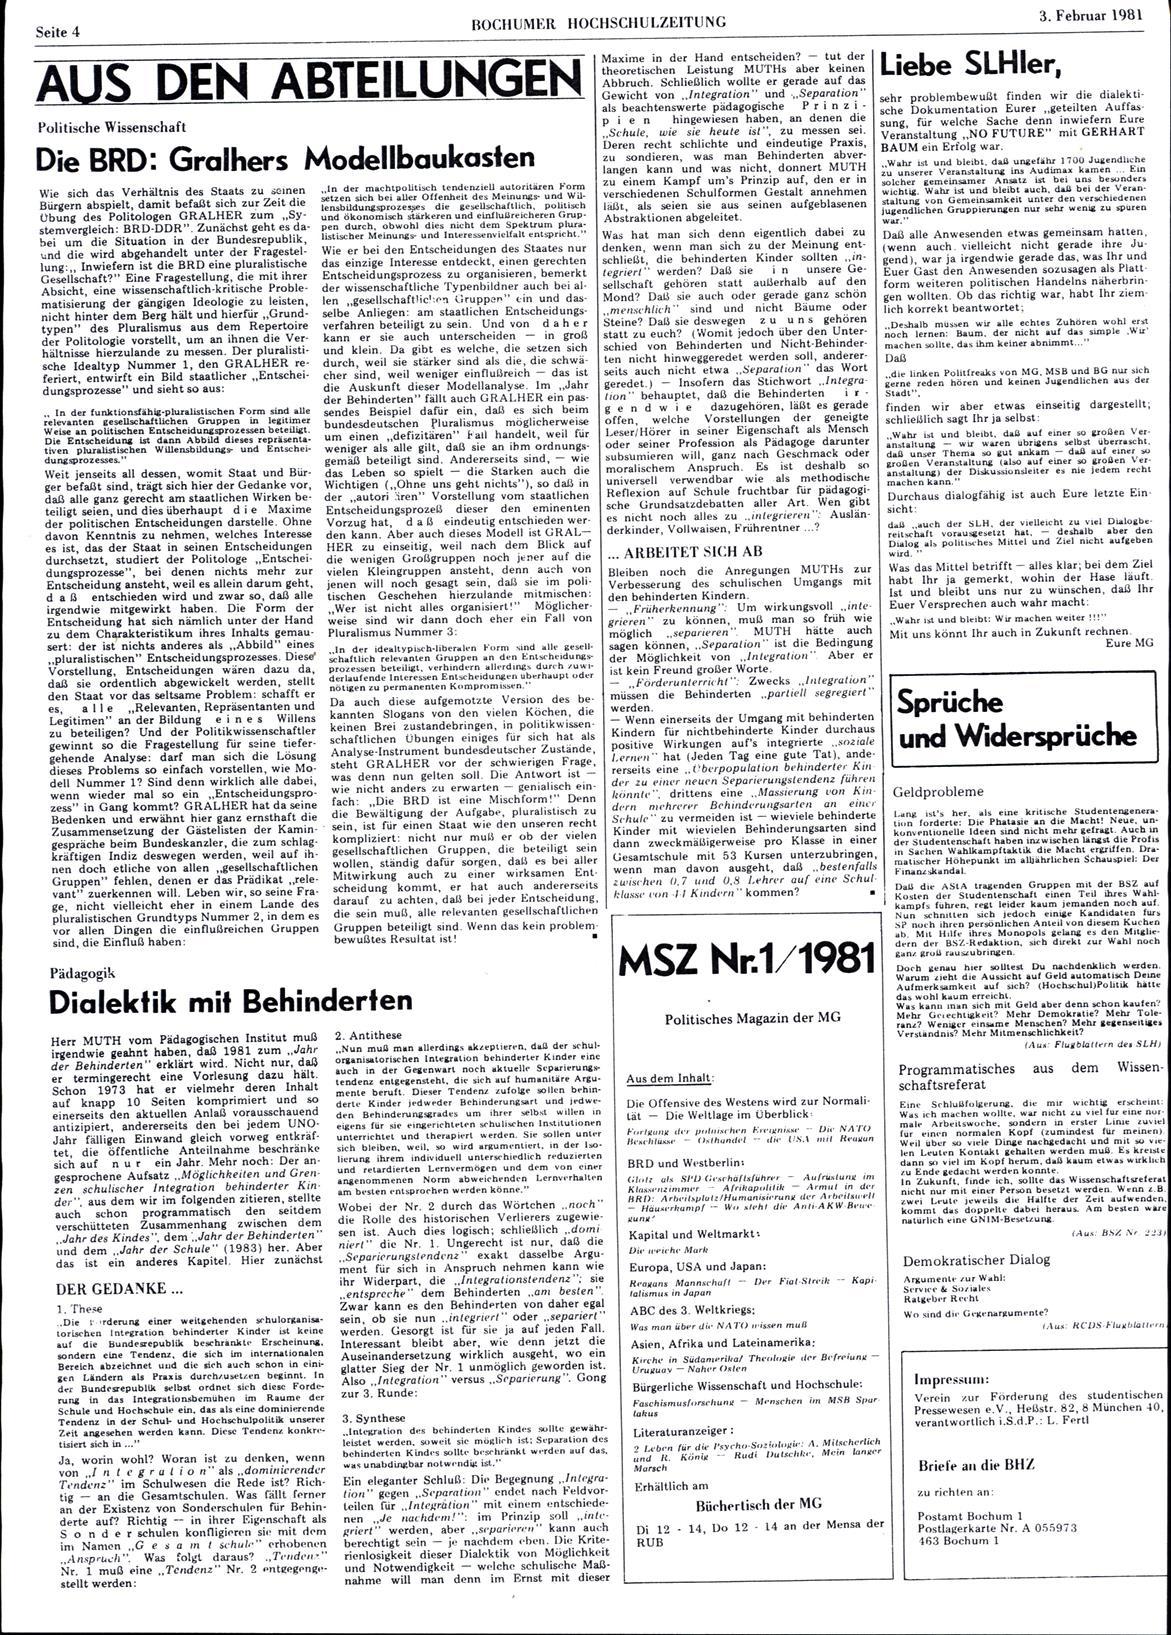 Bochum_BHZ_19810203_027_004